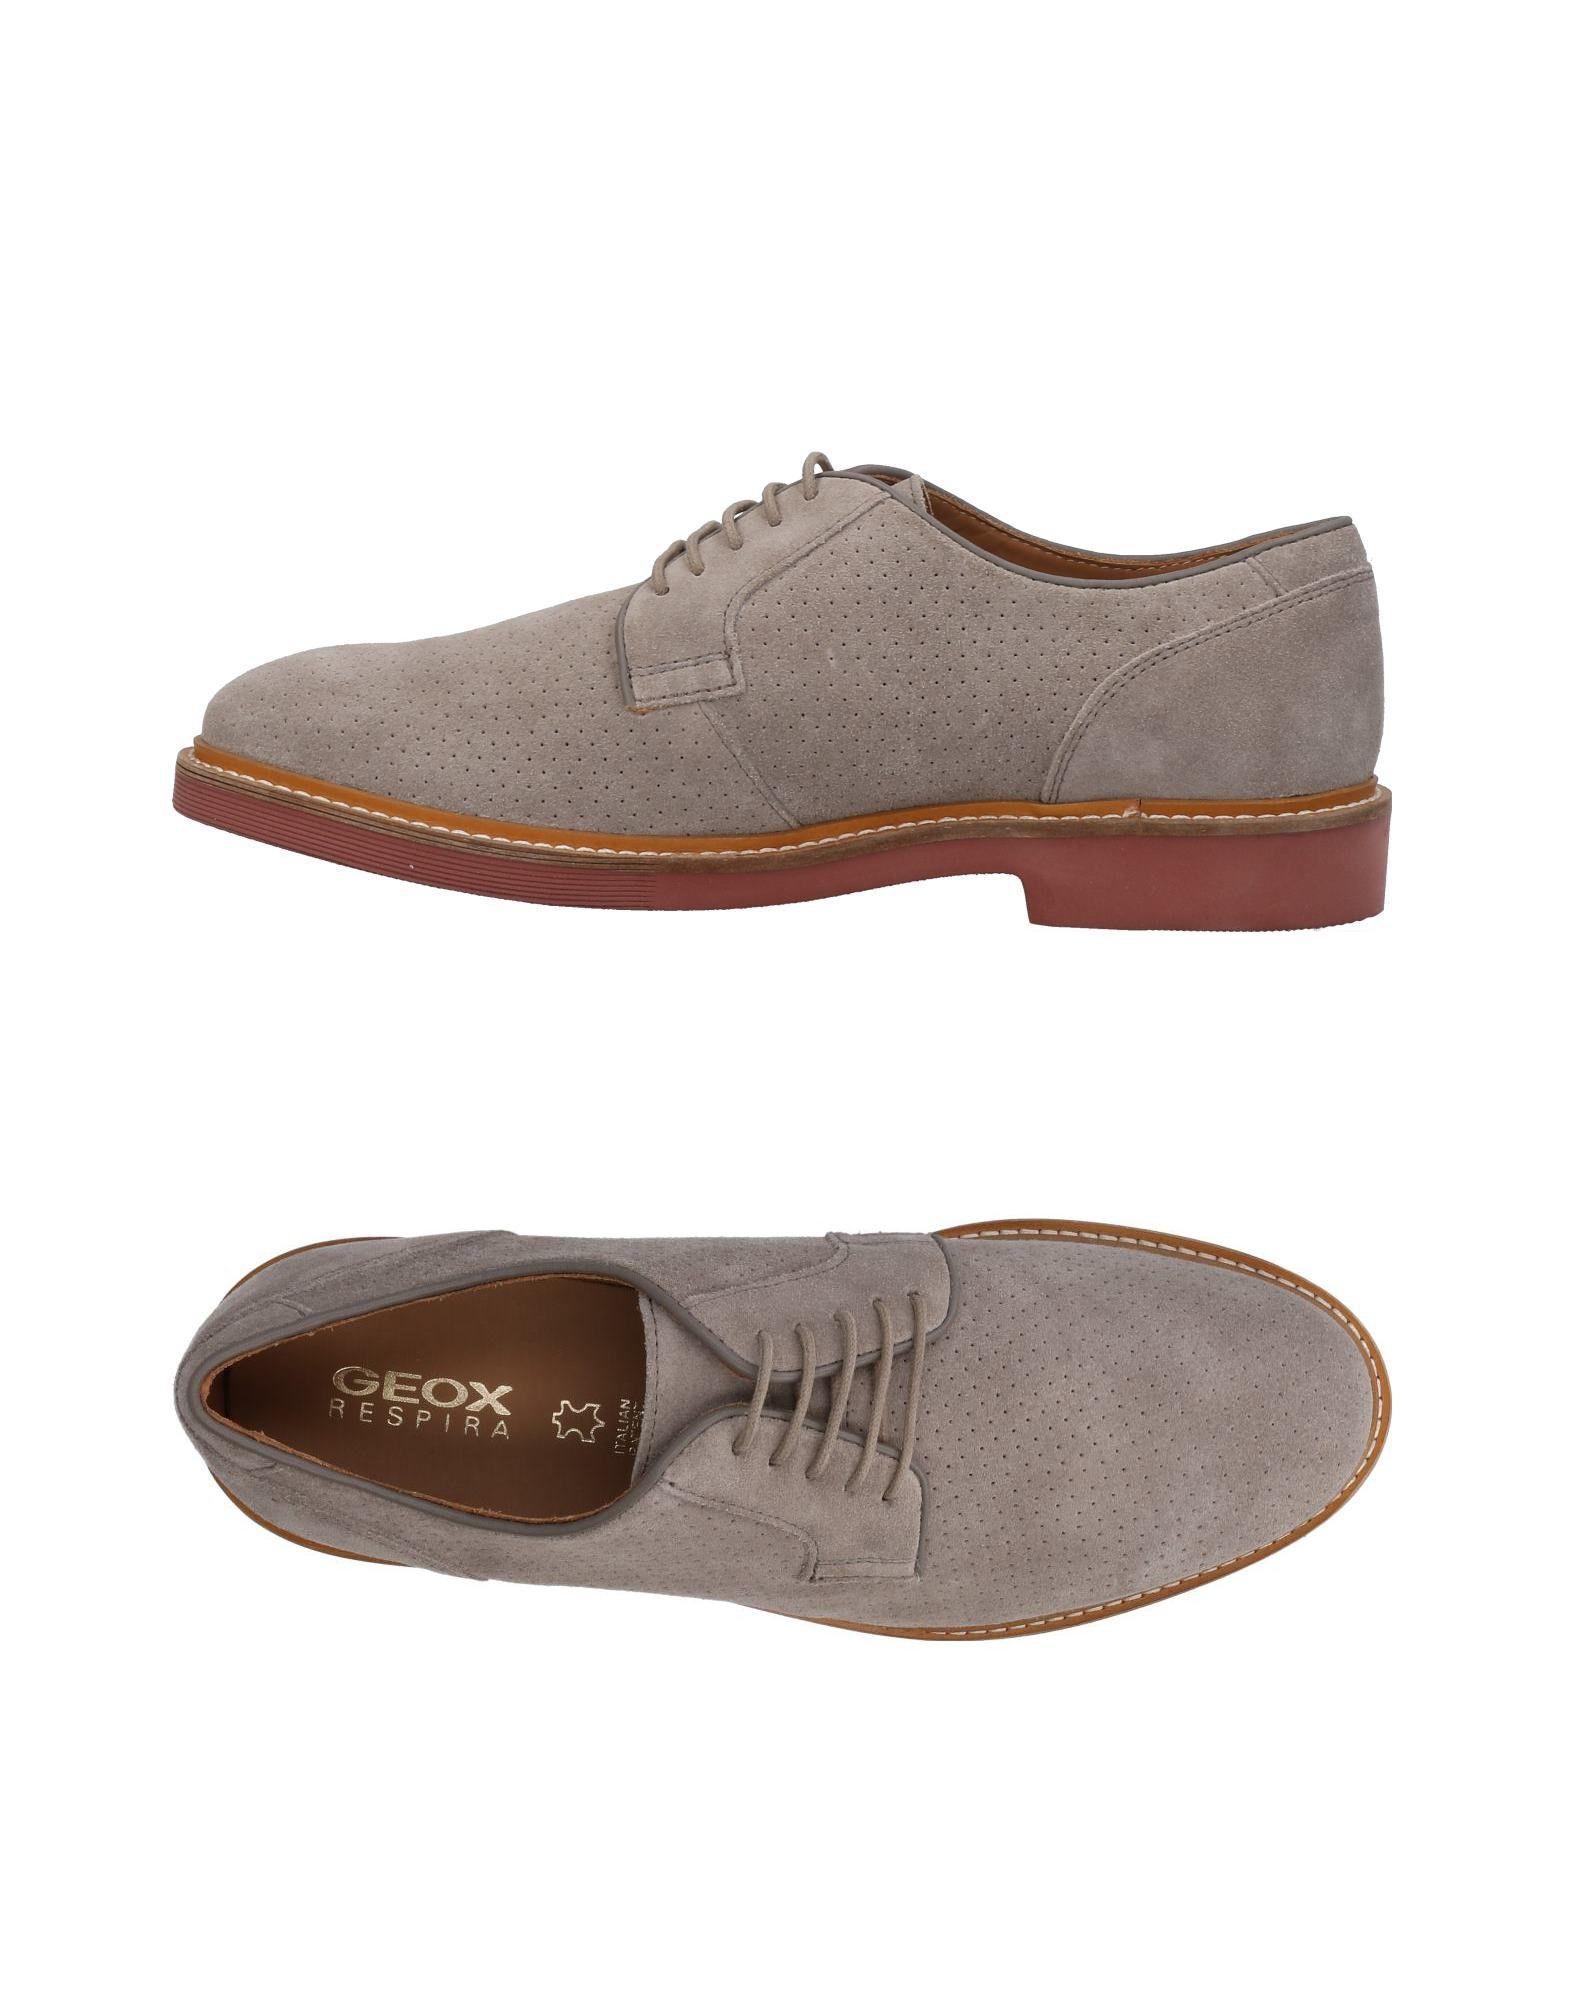 Rabatt echte Schuhe Geox Schnürschuhe Herren  11454099WG